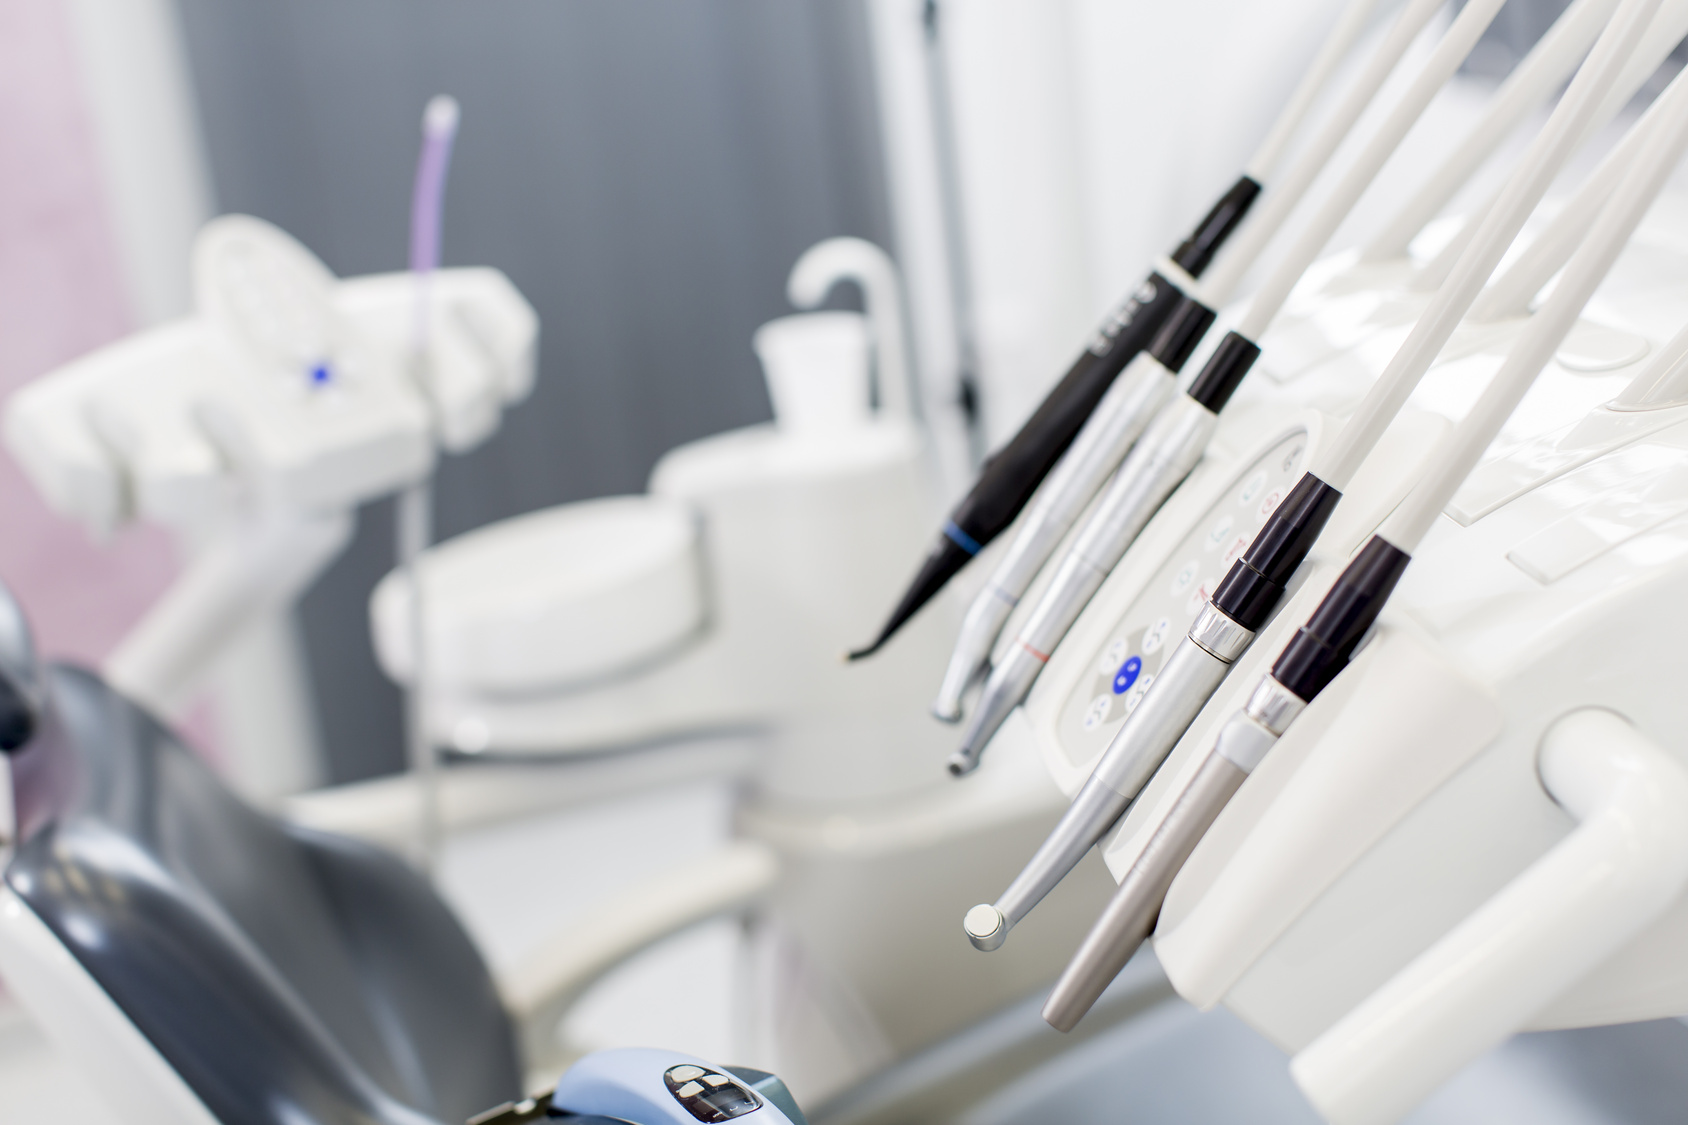 dentysta stomatolog fotolia - Fotolia.pl